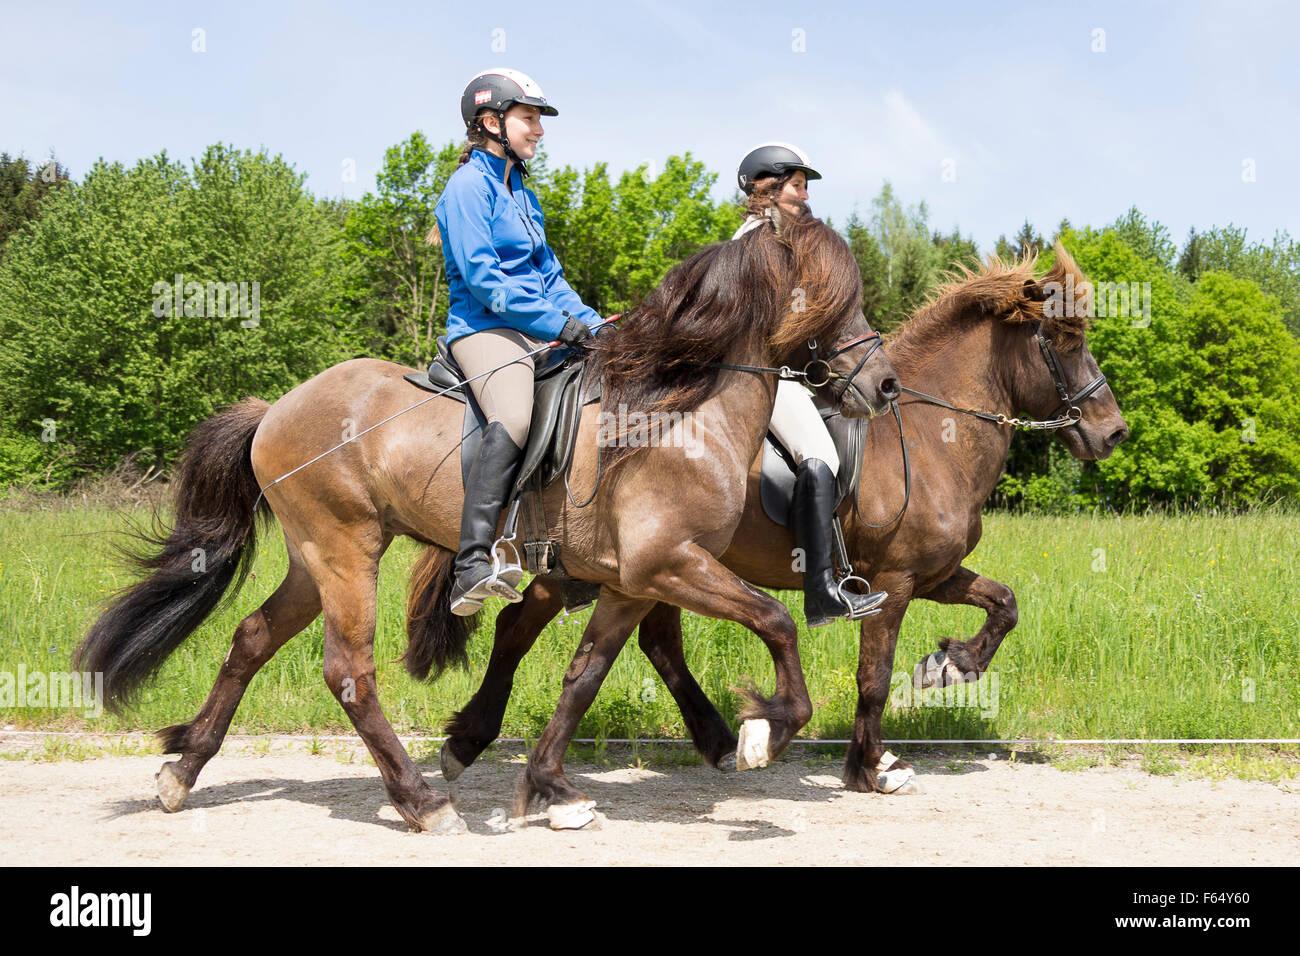 Icelandic Horse. Two women performing the toelt on stallionse. Austria - Stock Image